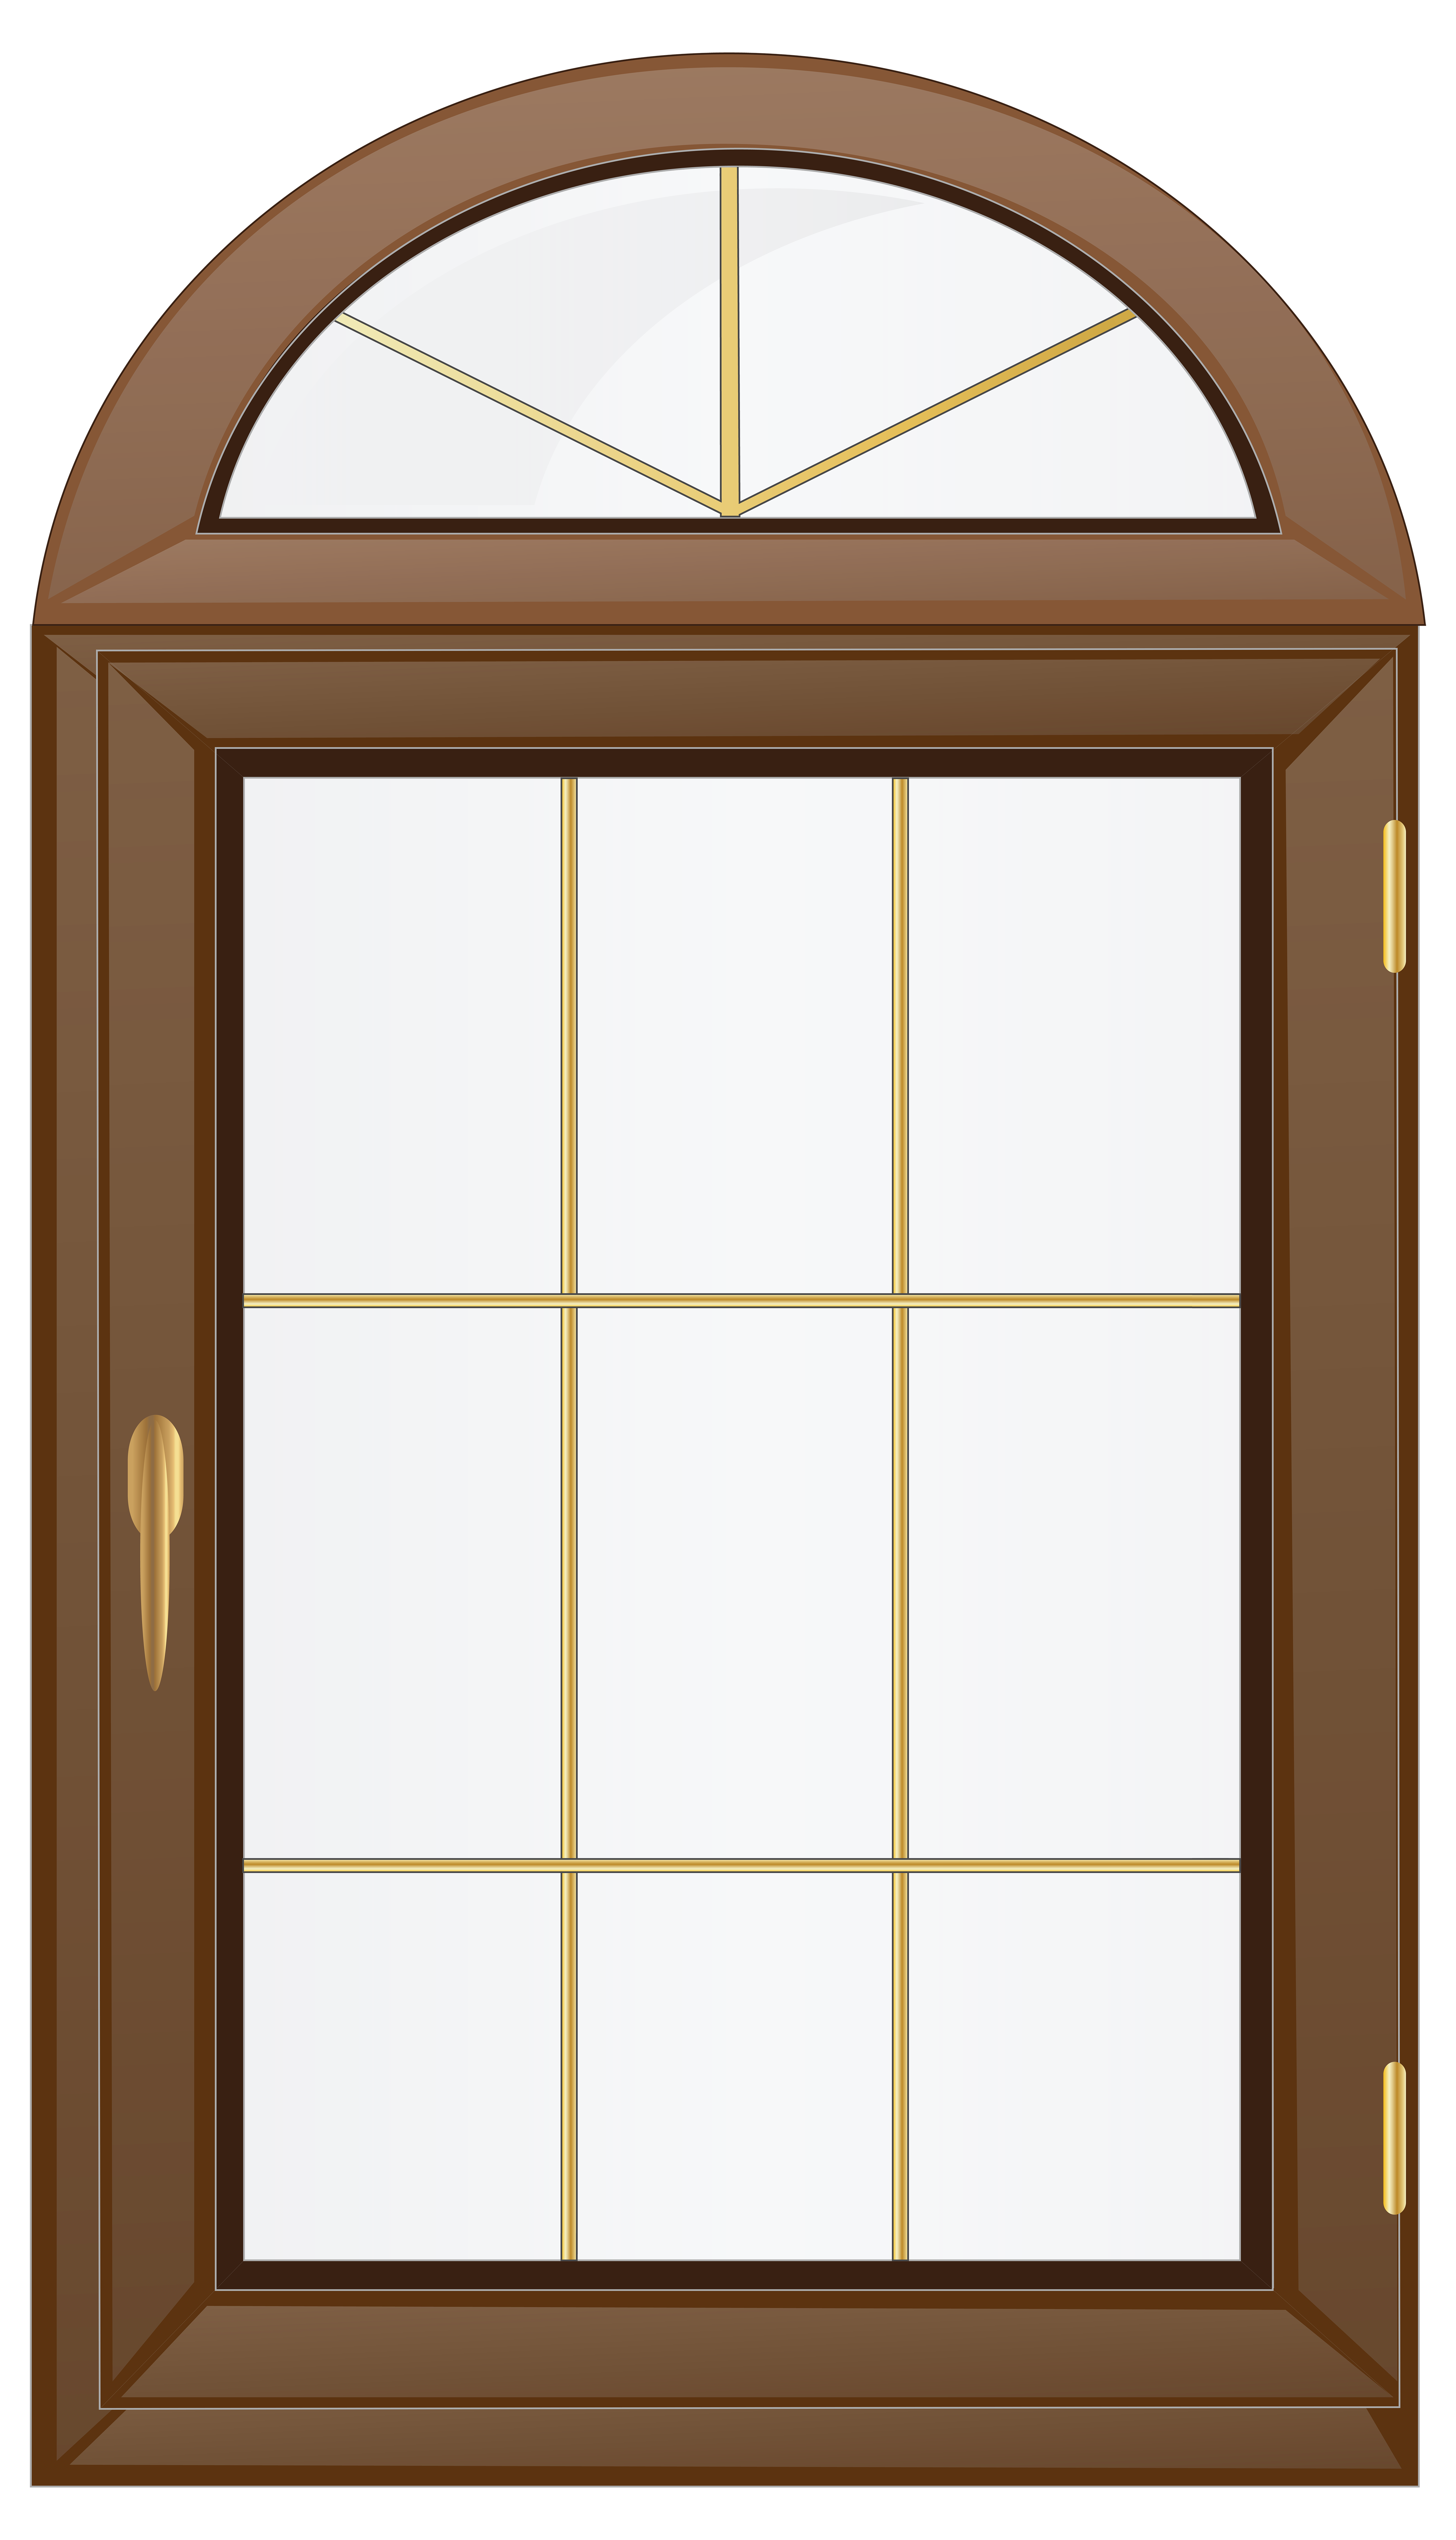 Clipart window.